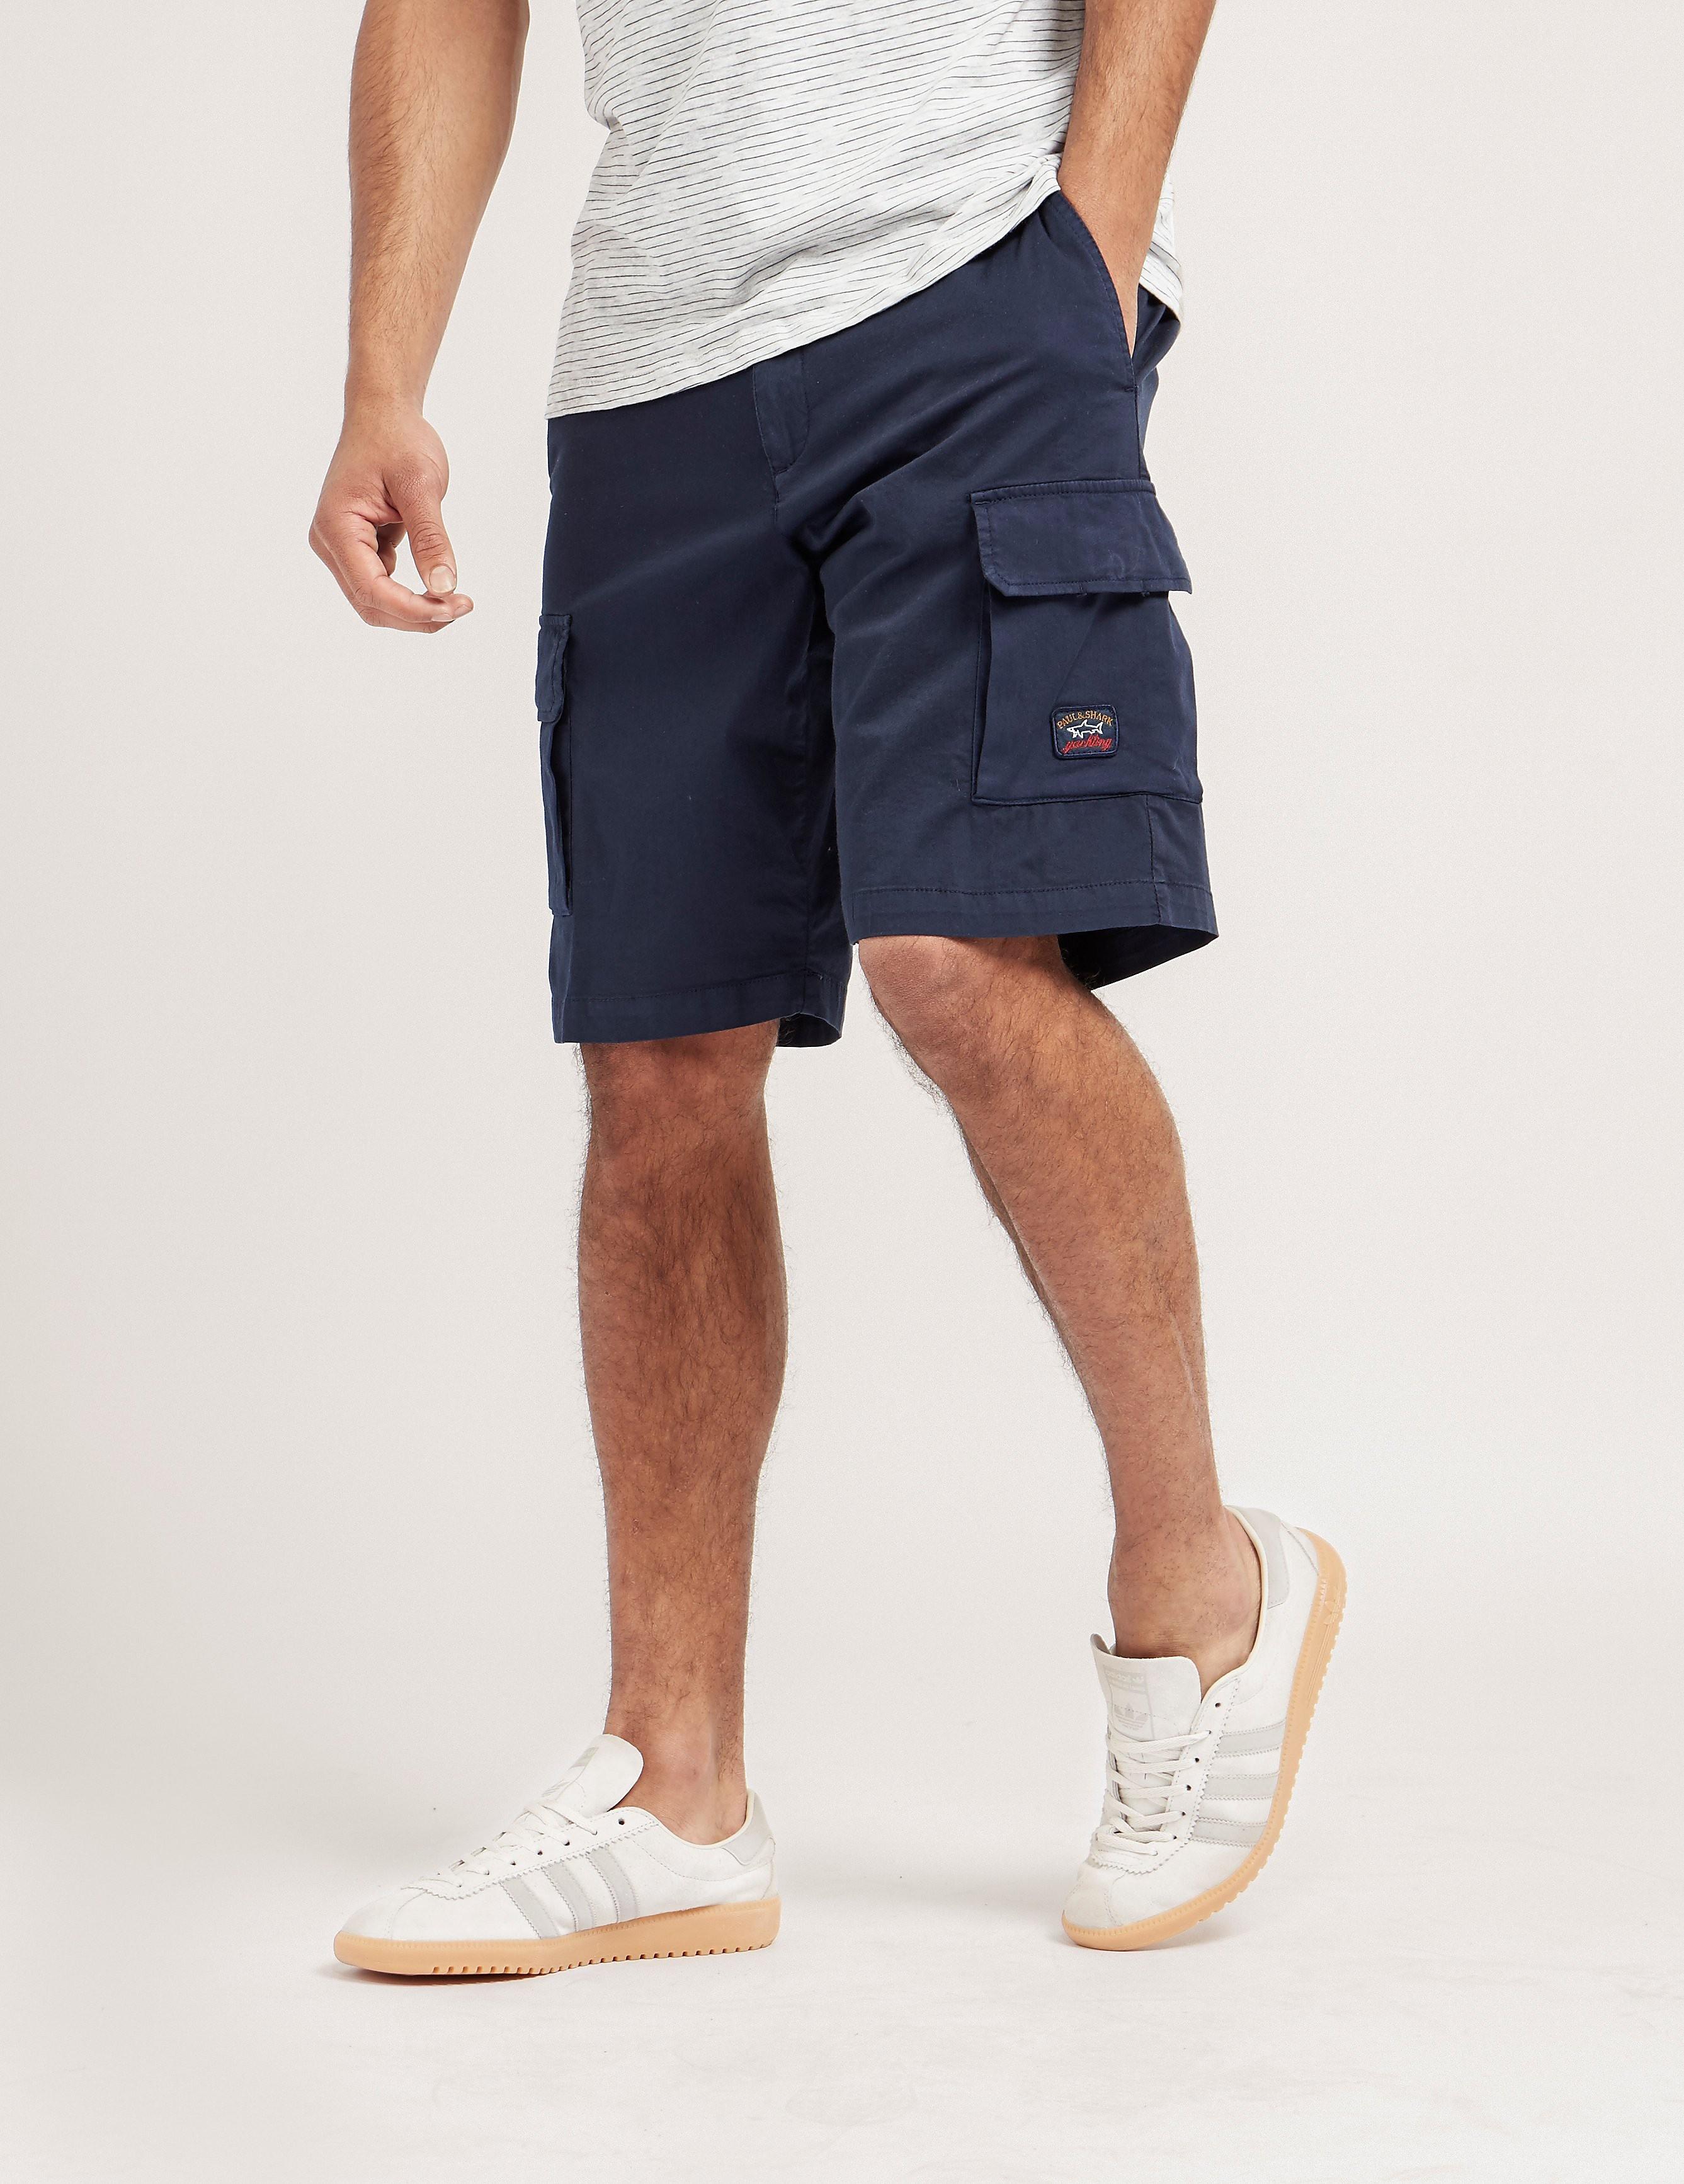 Paul and Shark Cargo Shorts